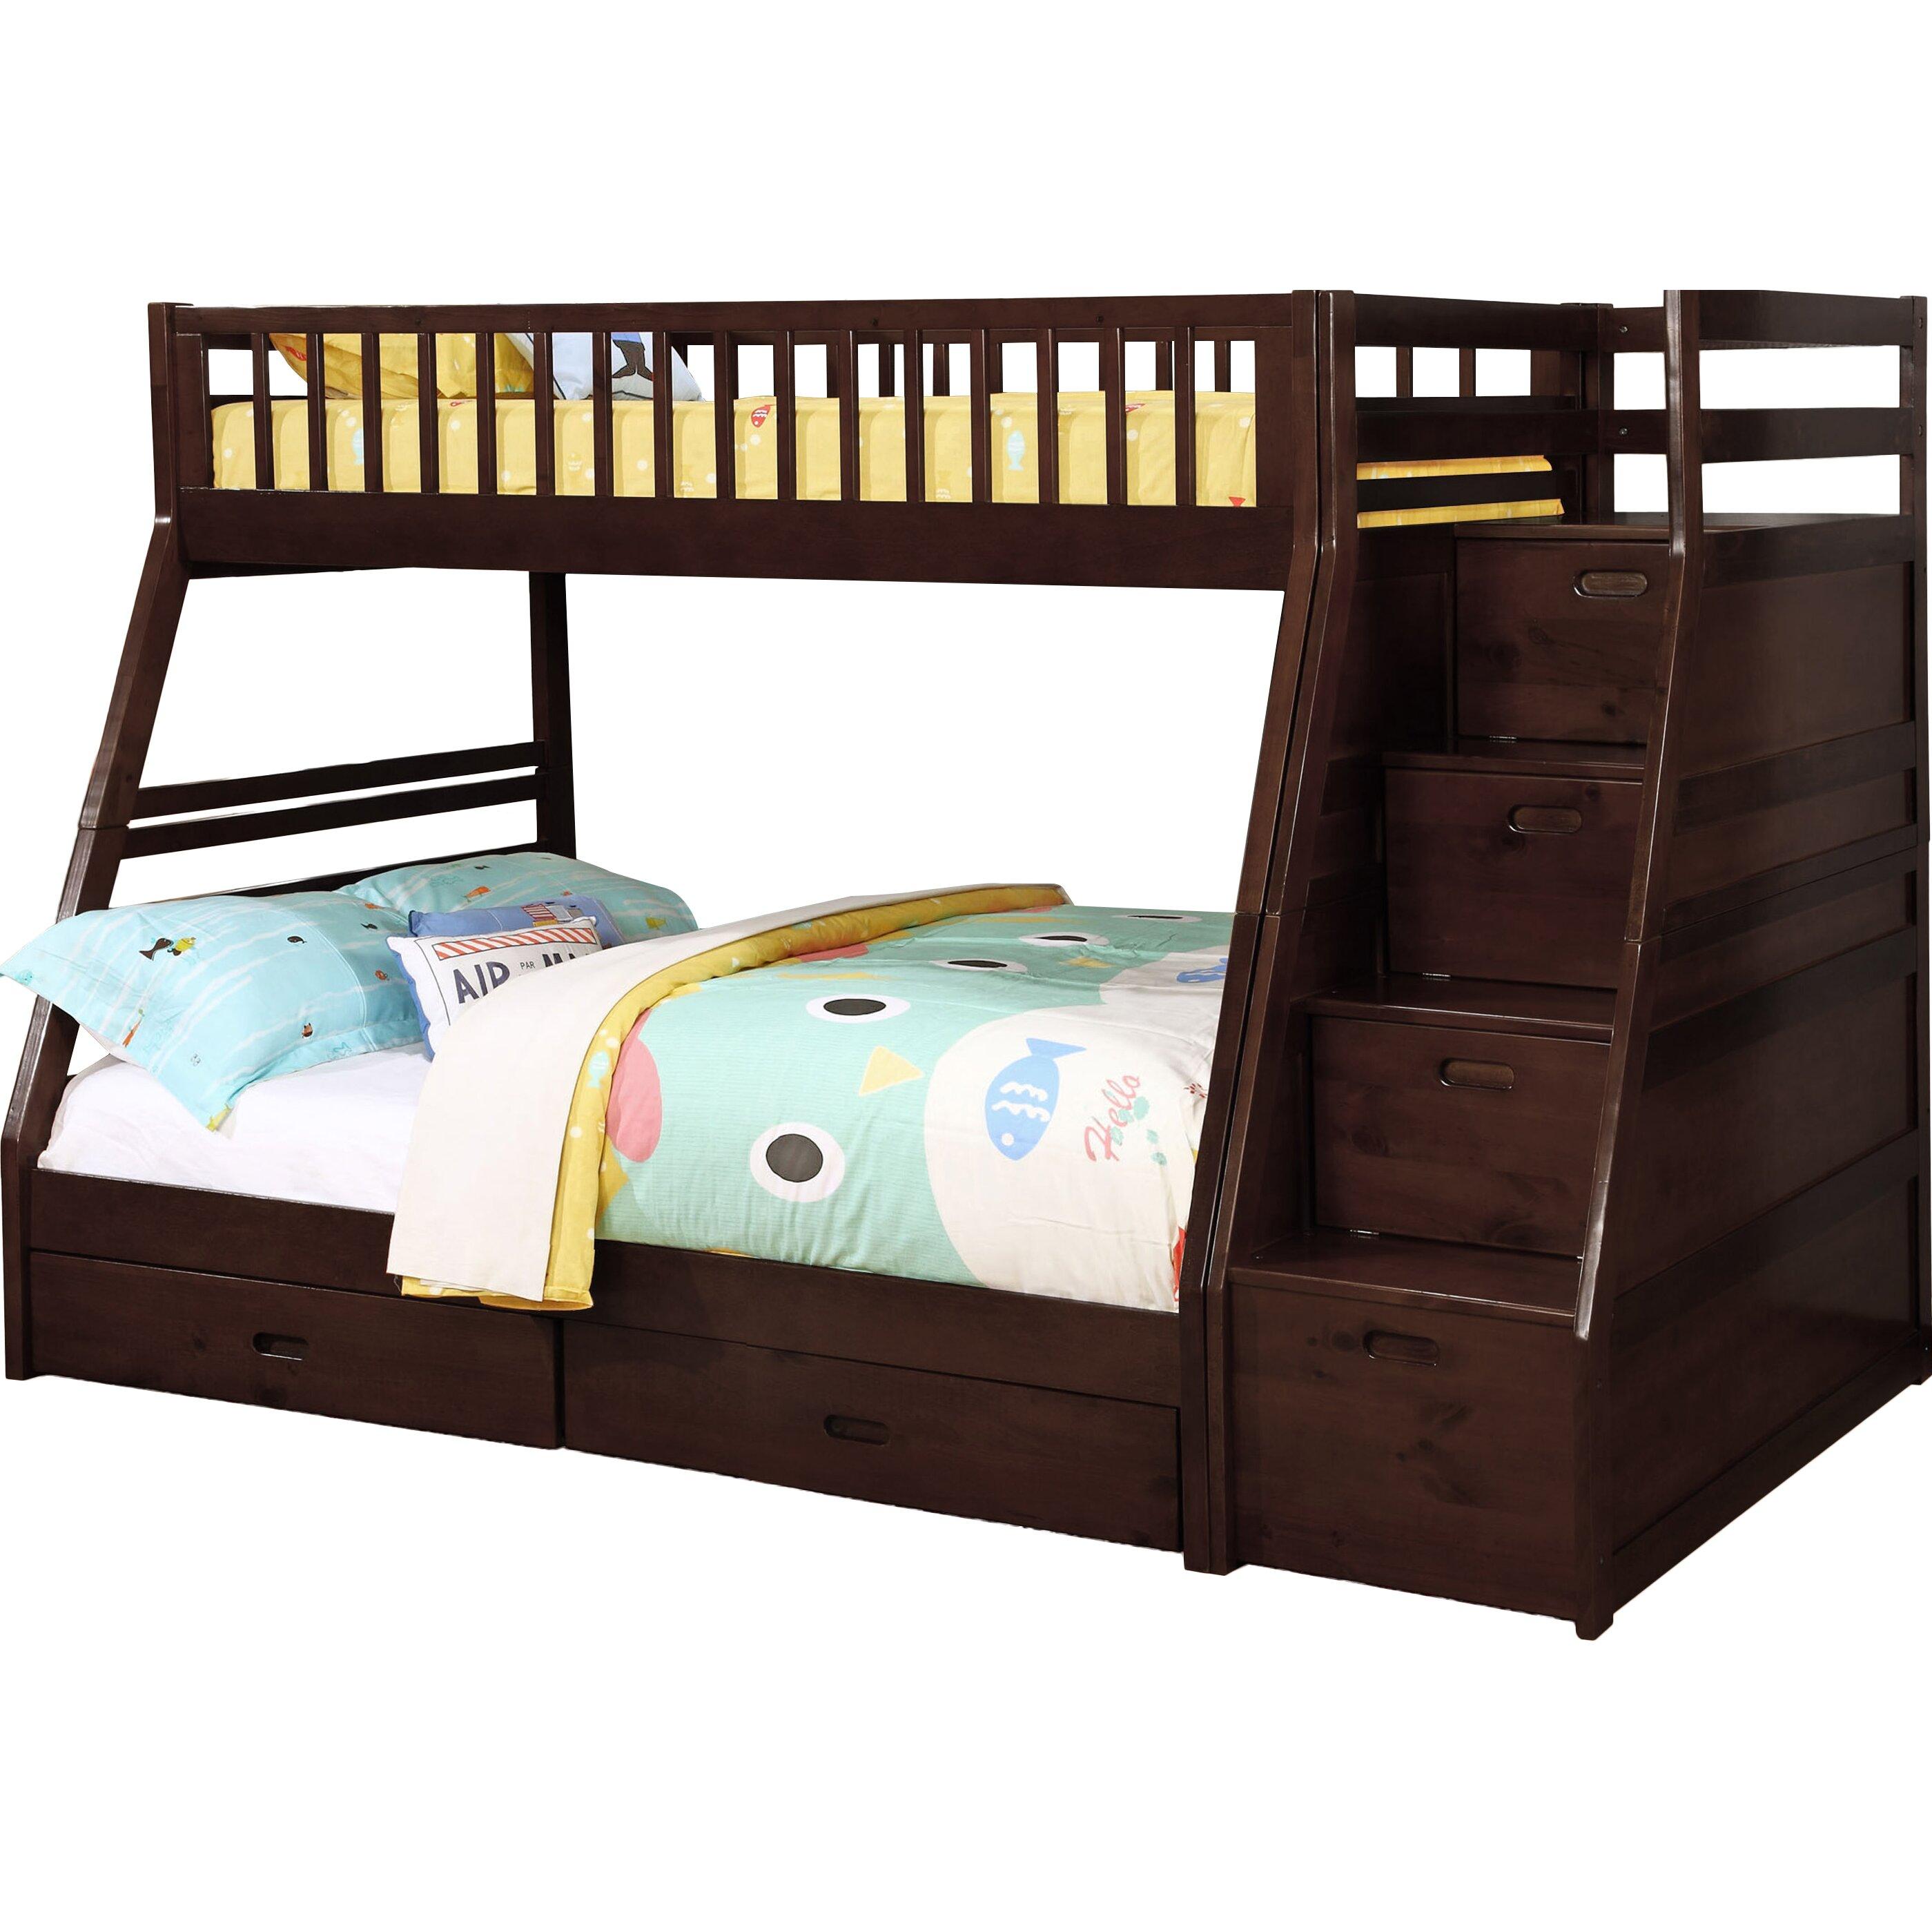 Dakota Twin Over Full Bunk Bed